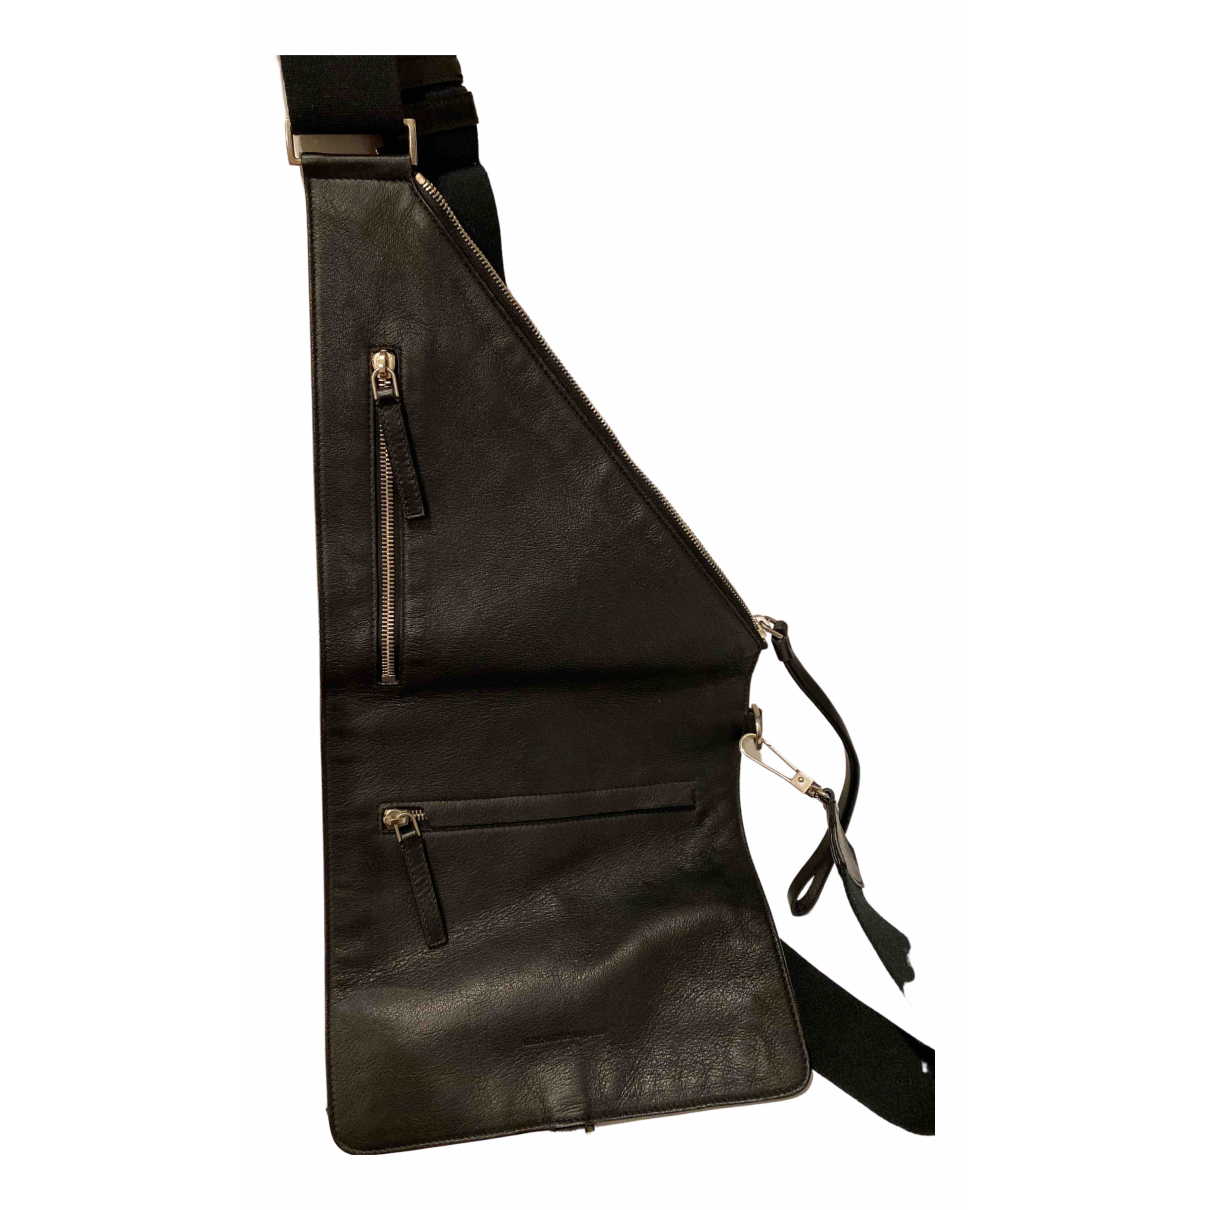 Alexander Mcqueen N Black Leather bag for Men N